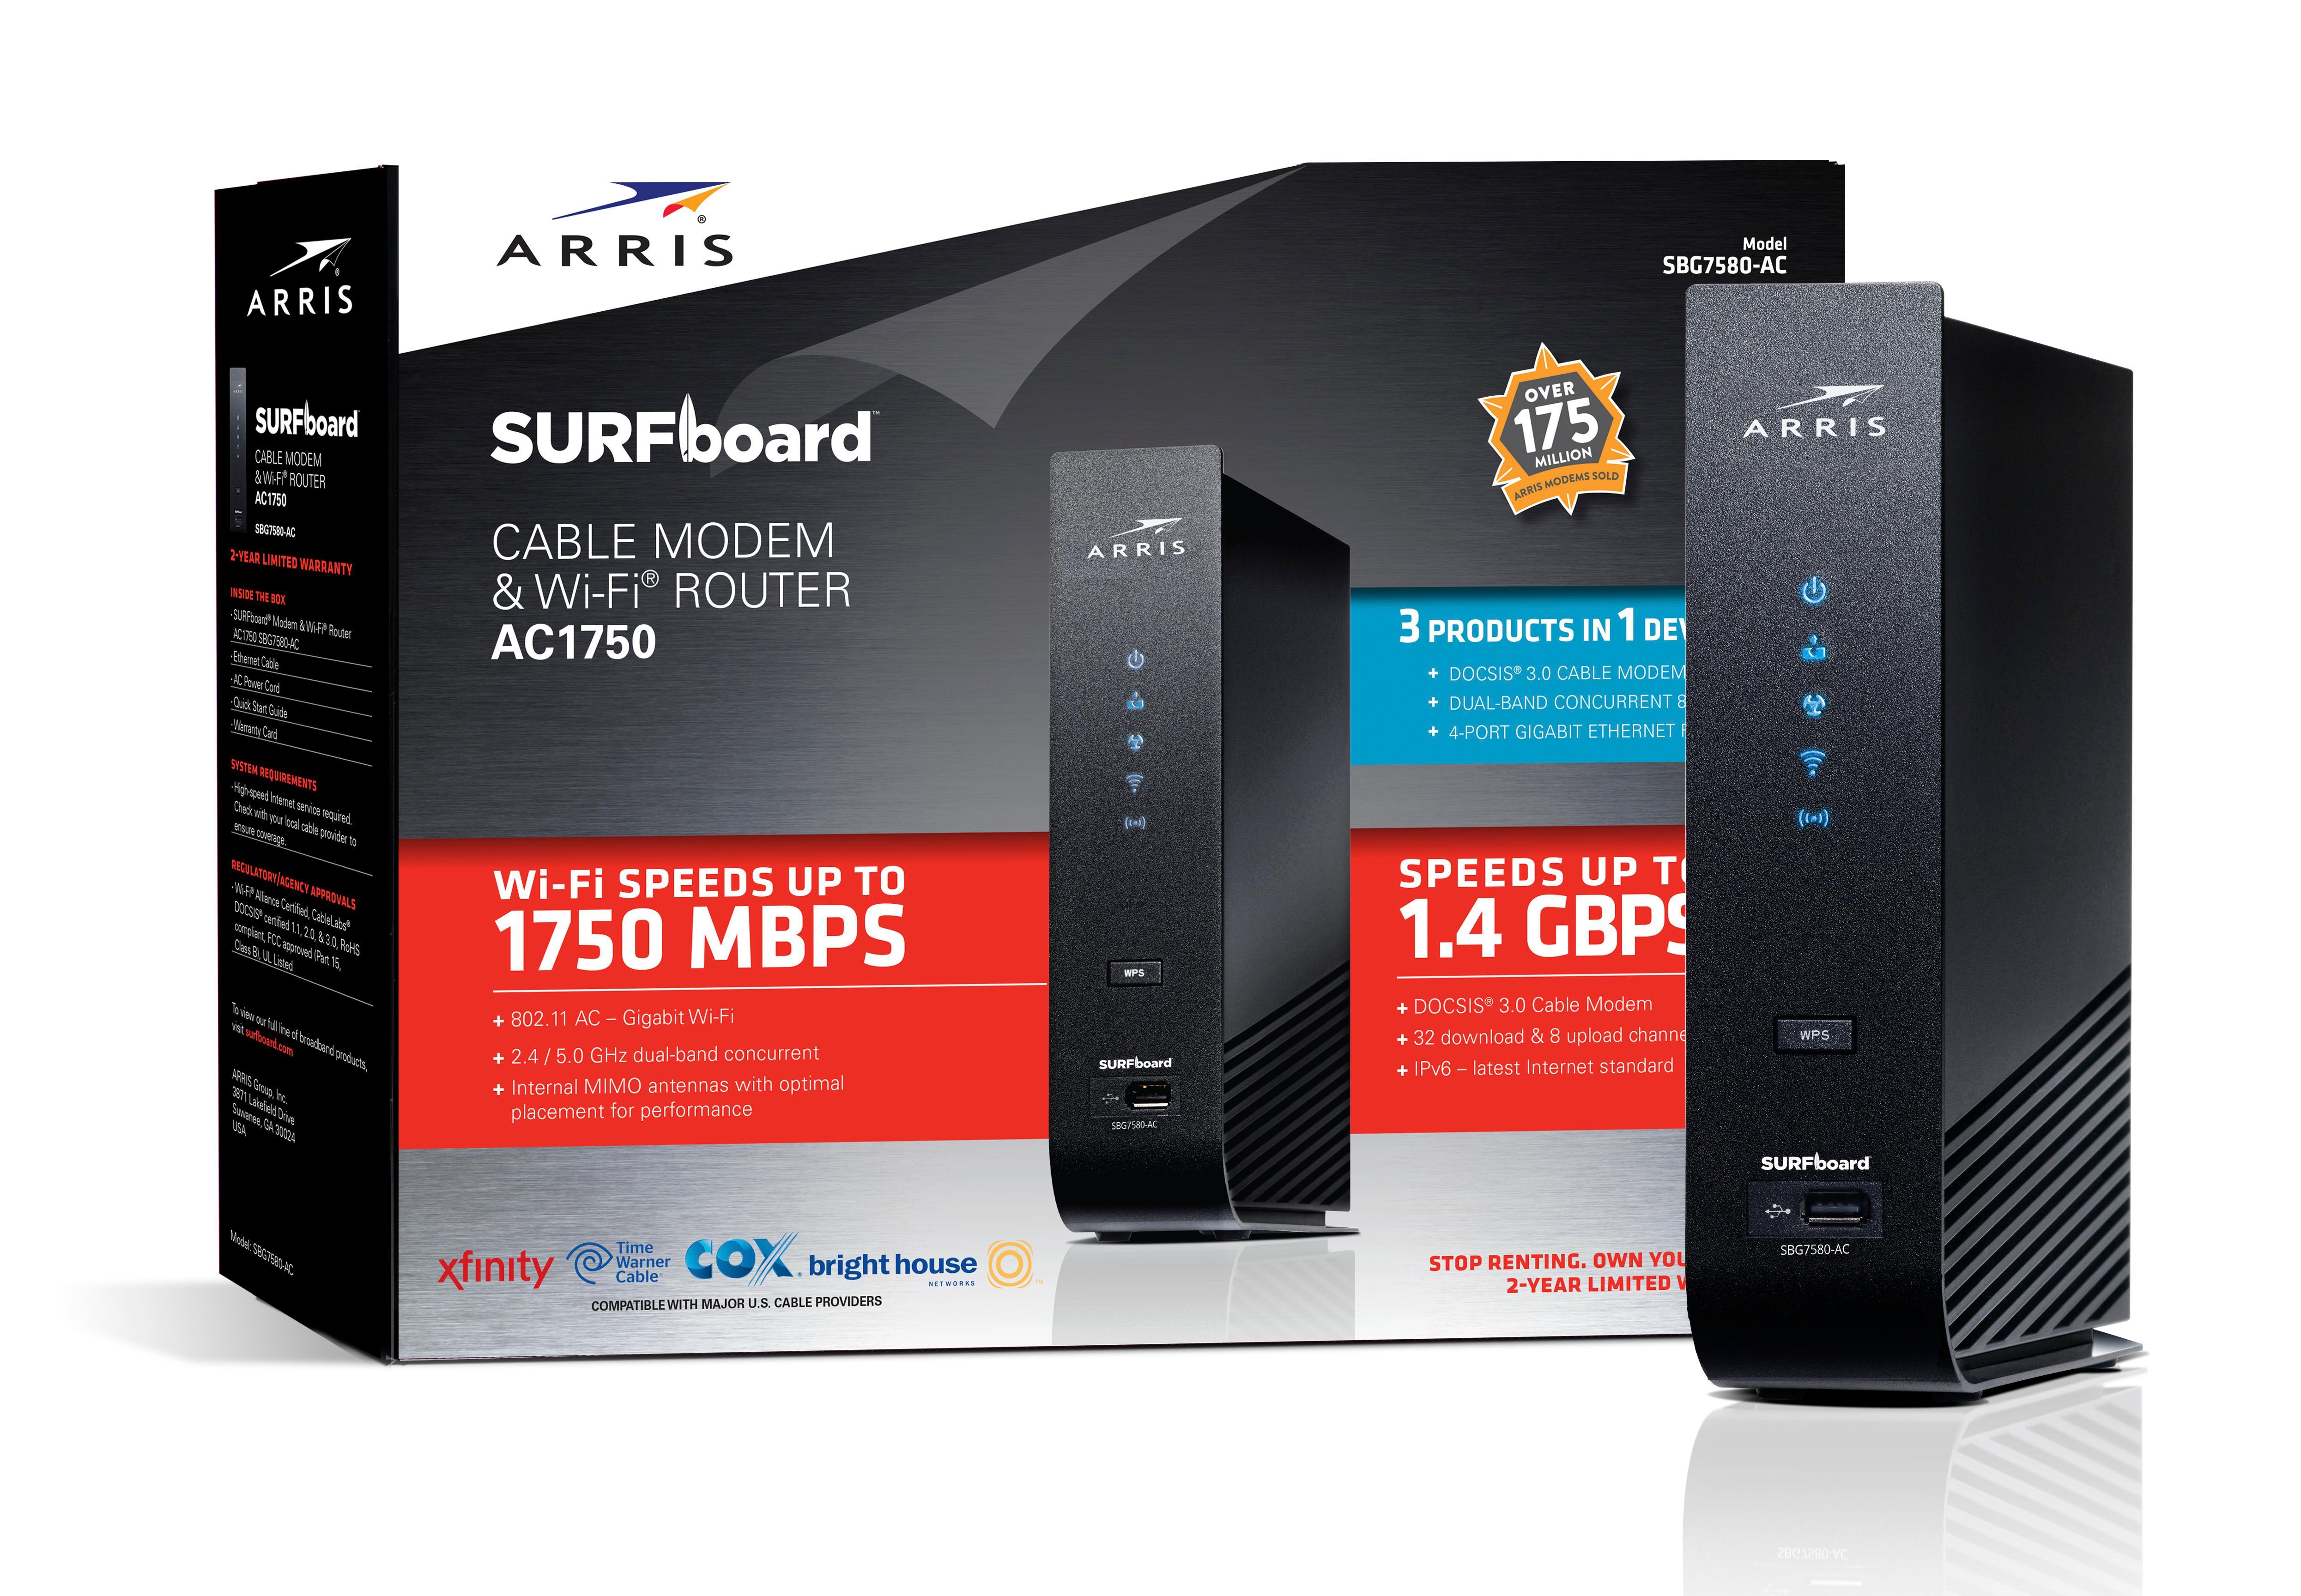 motorola surfboard. sbg7580-ac wi-fi cable modem motorola surfboard d